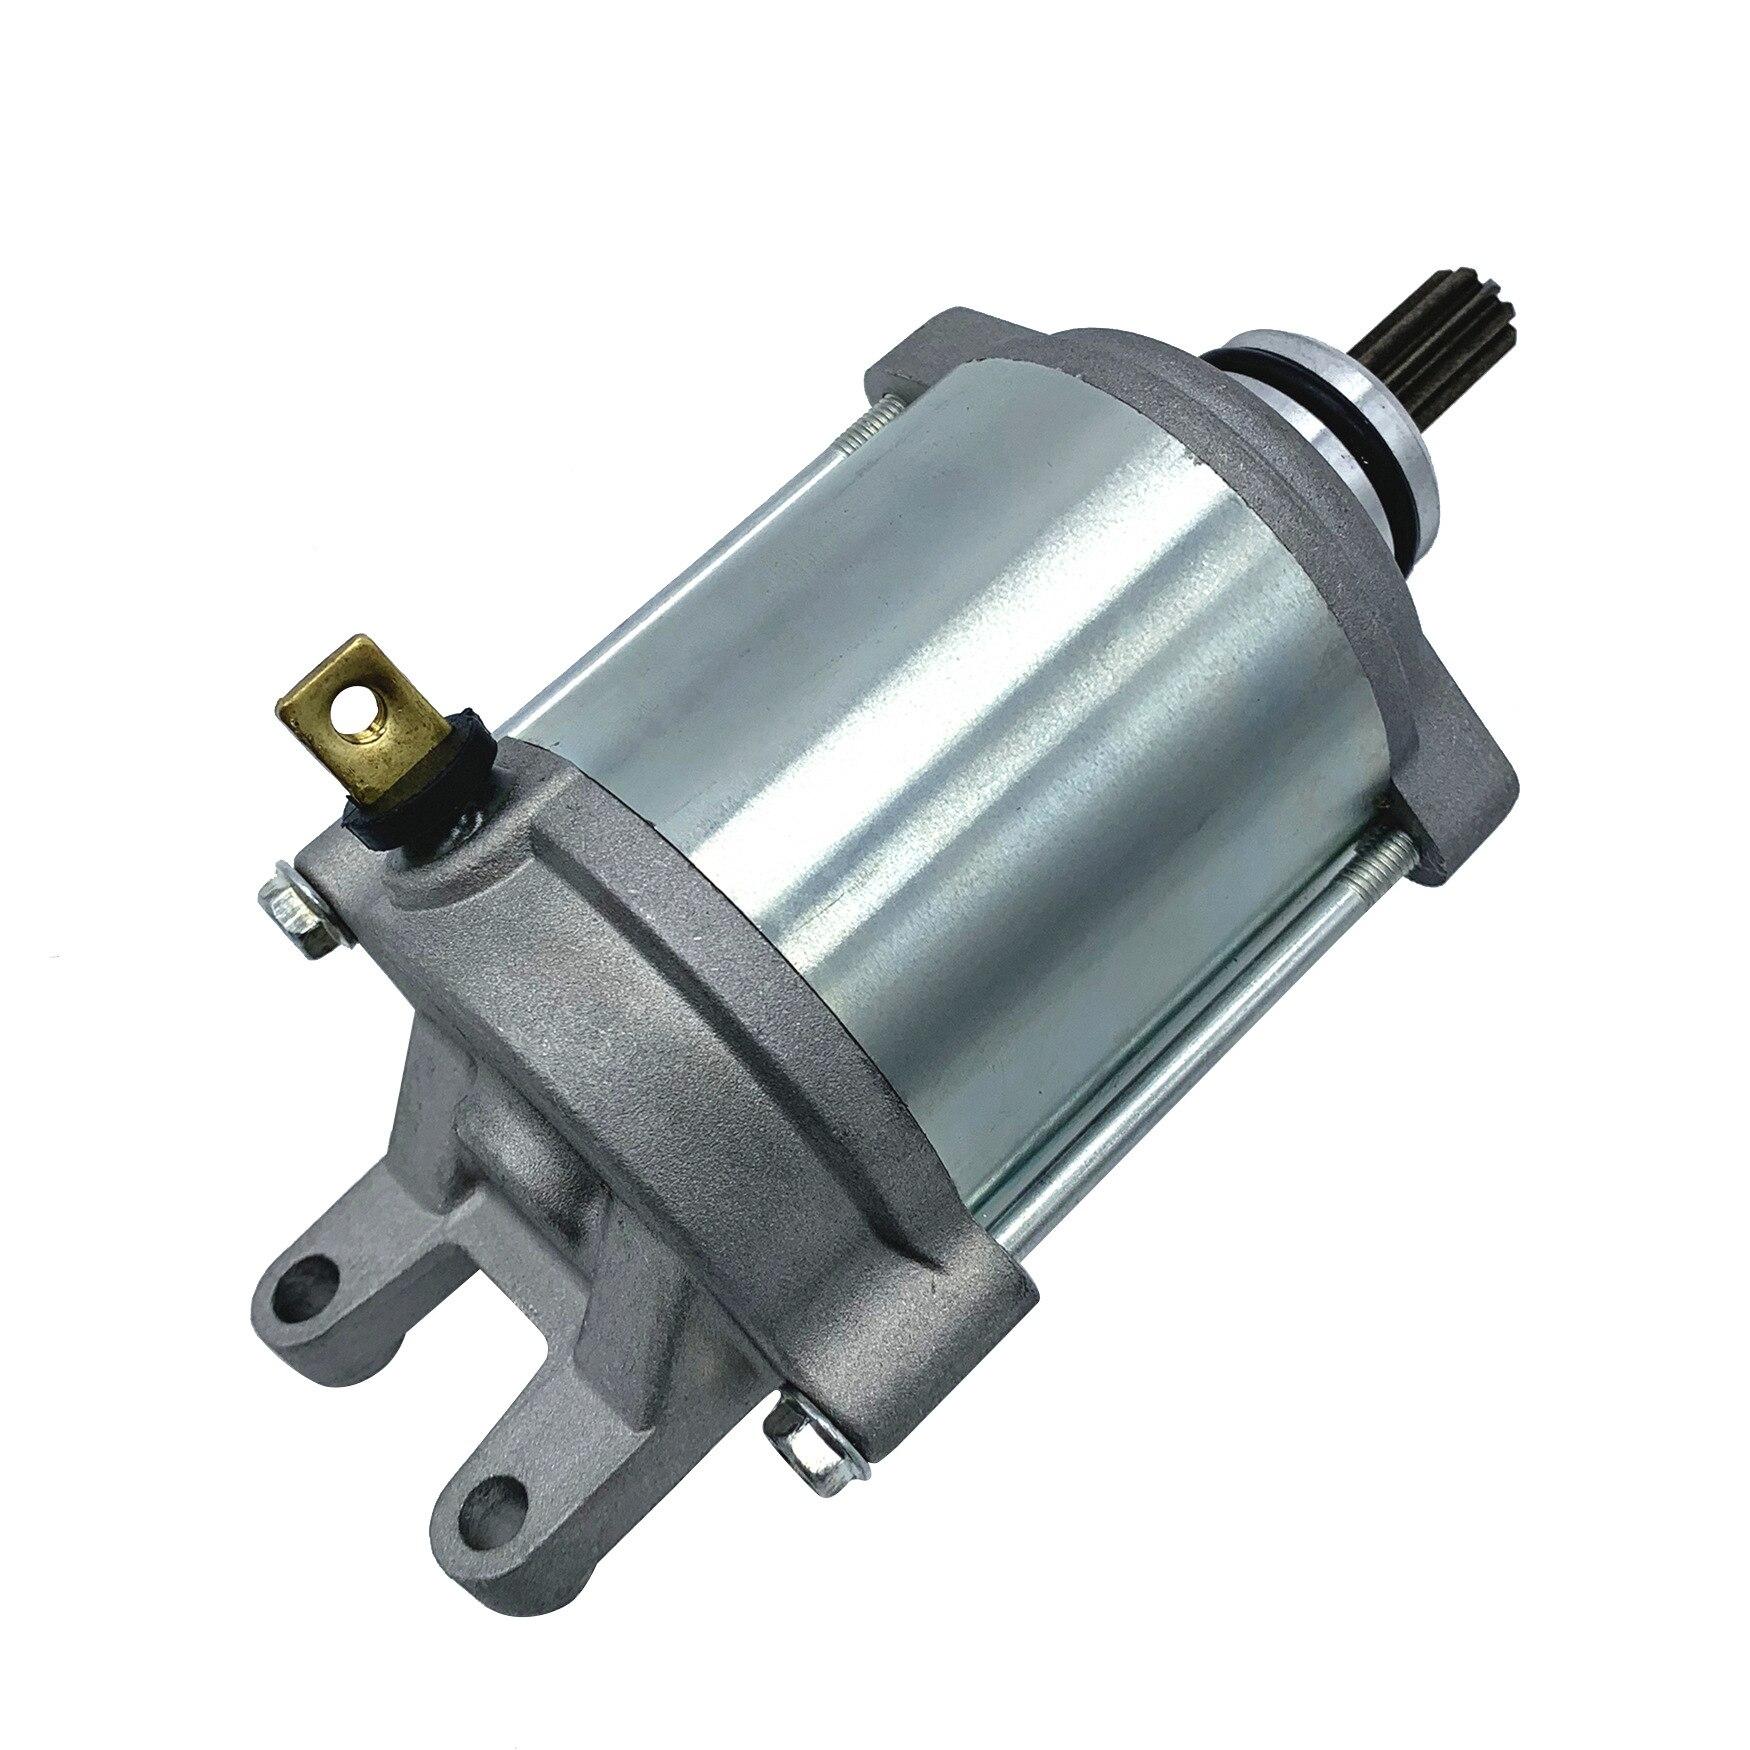 Motorcycle Electrical Engine Starter Motor For SUZUKI GSX-R1000 GSX R1000 Gsxr1000 Large Discharge Capacity Starter 228000-8770